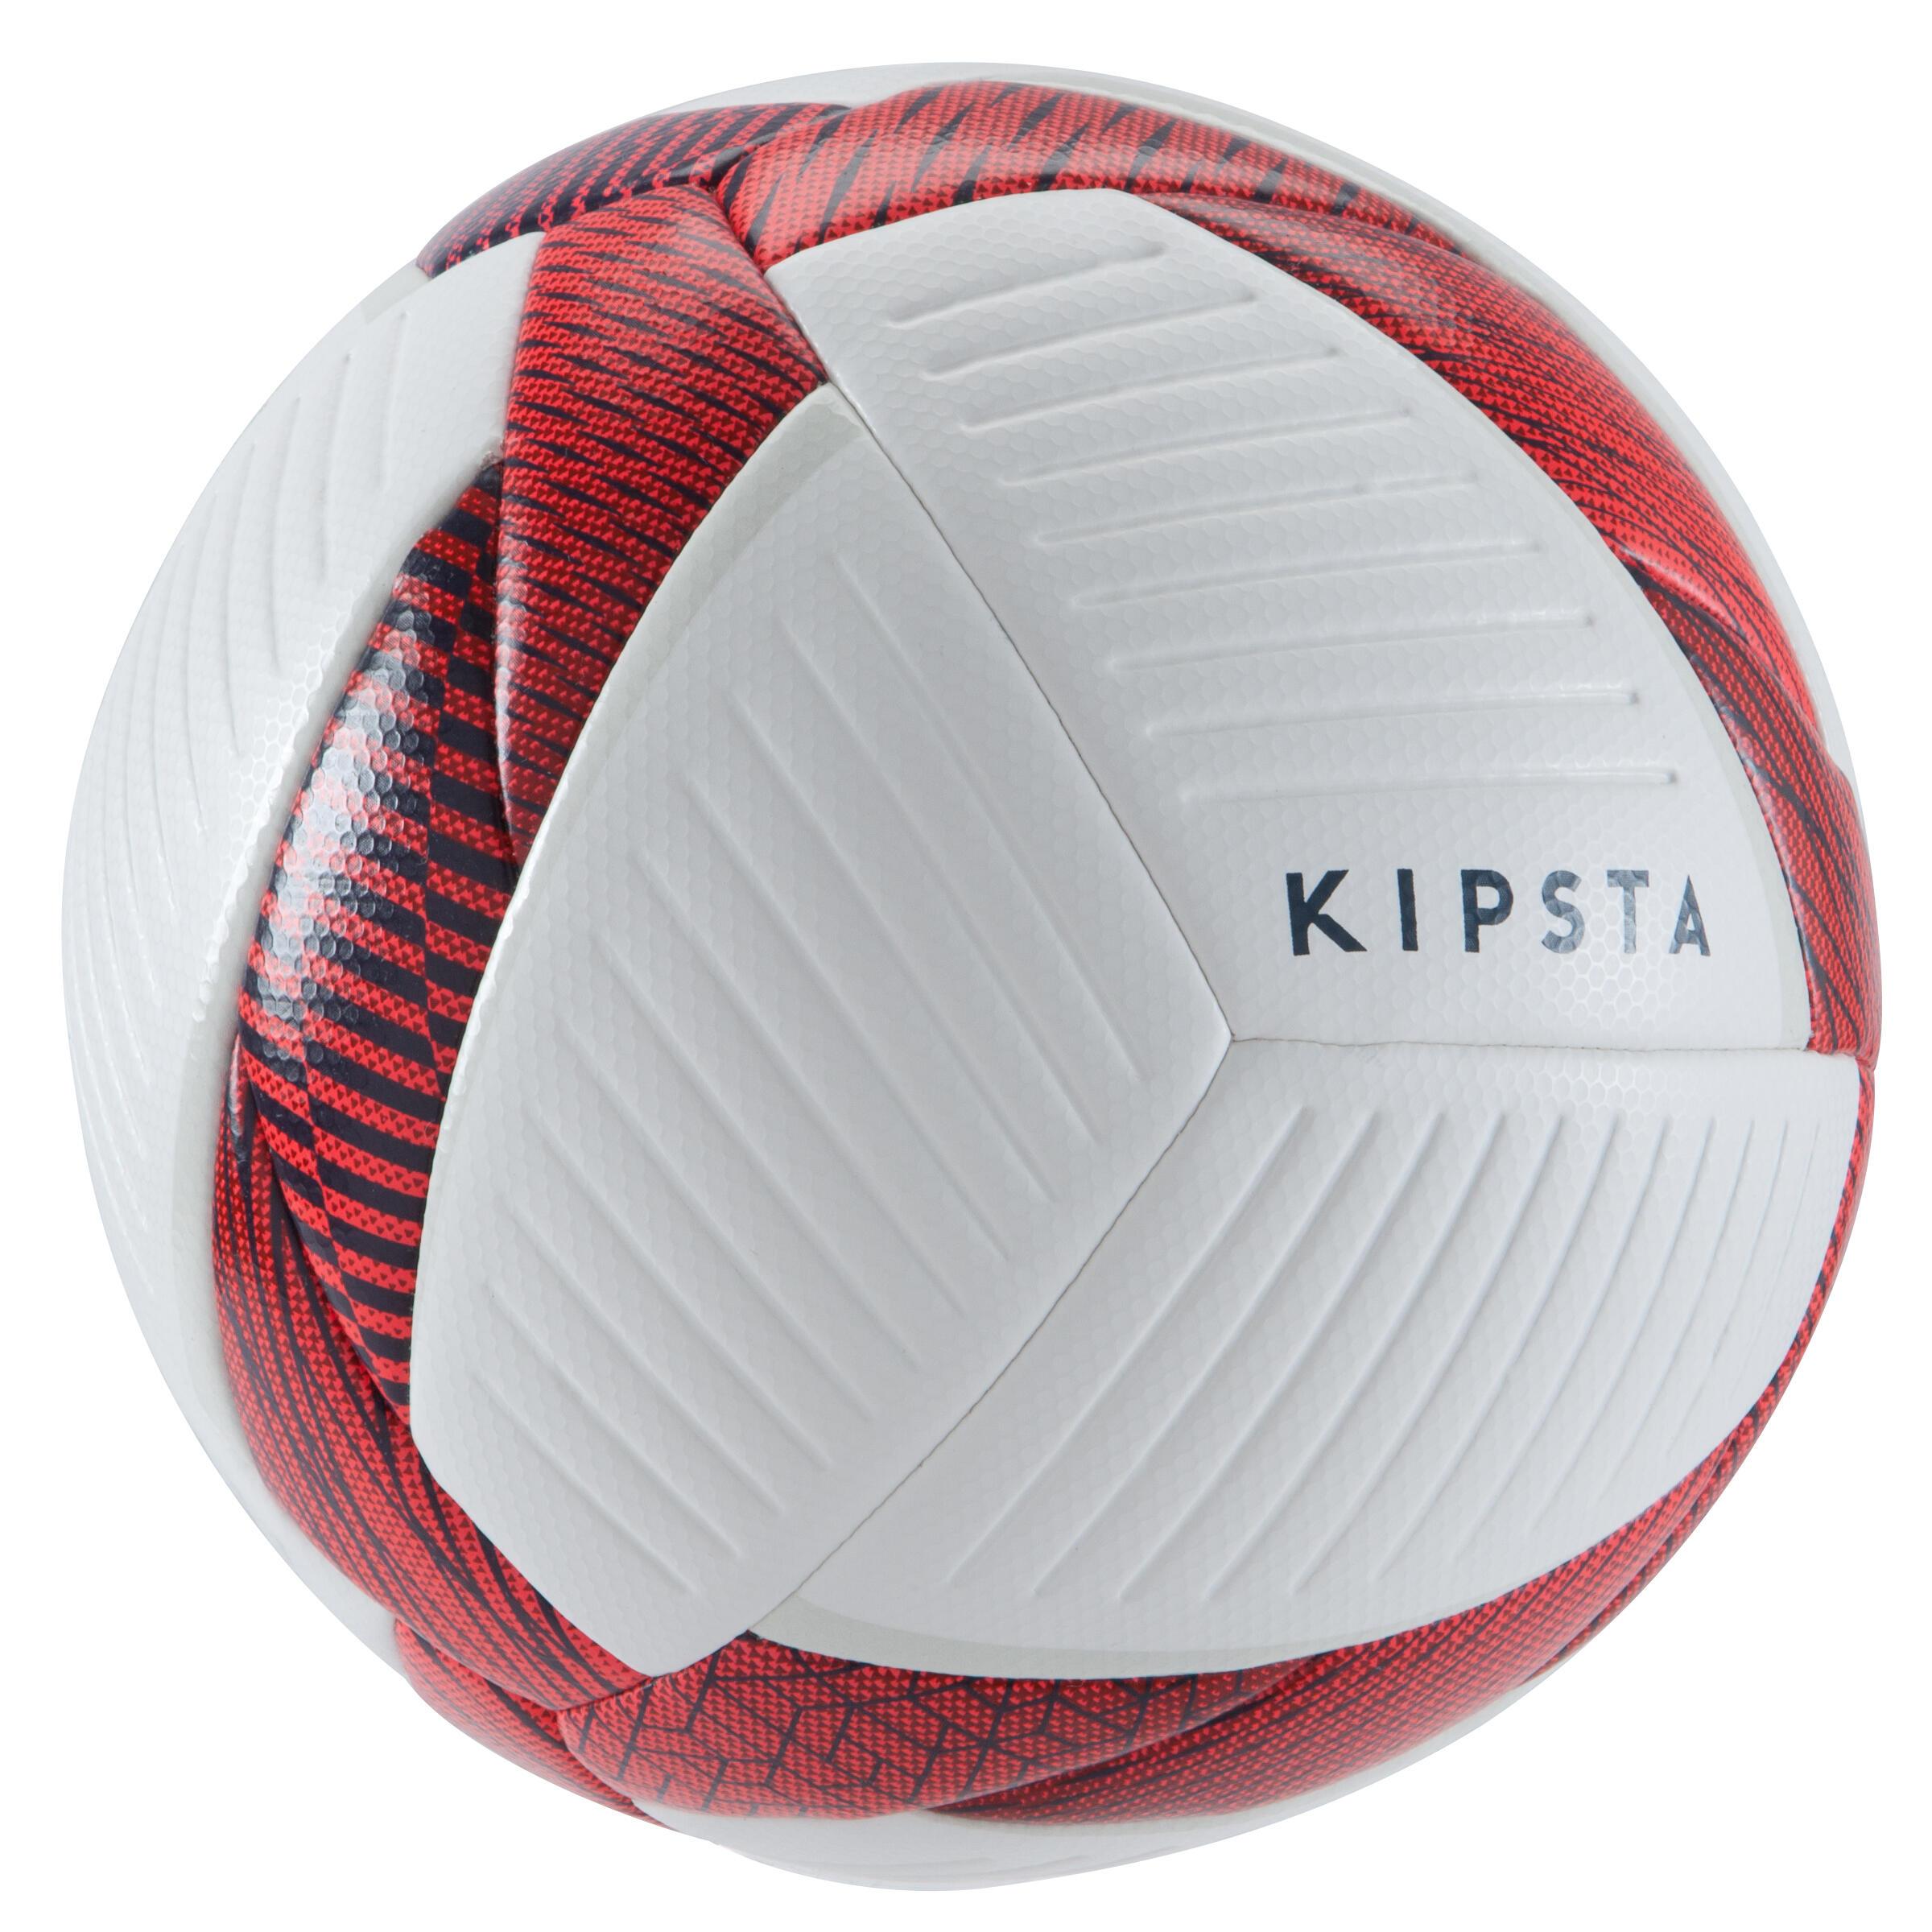 Futsal 500 Hybrid Football 63 cm - White